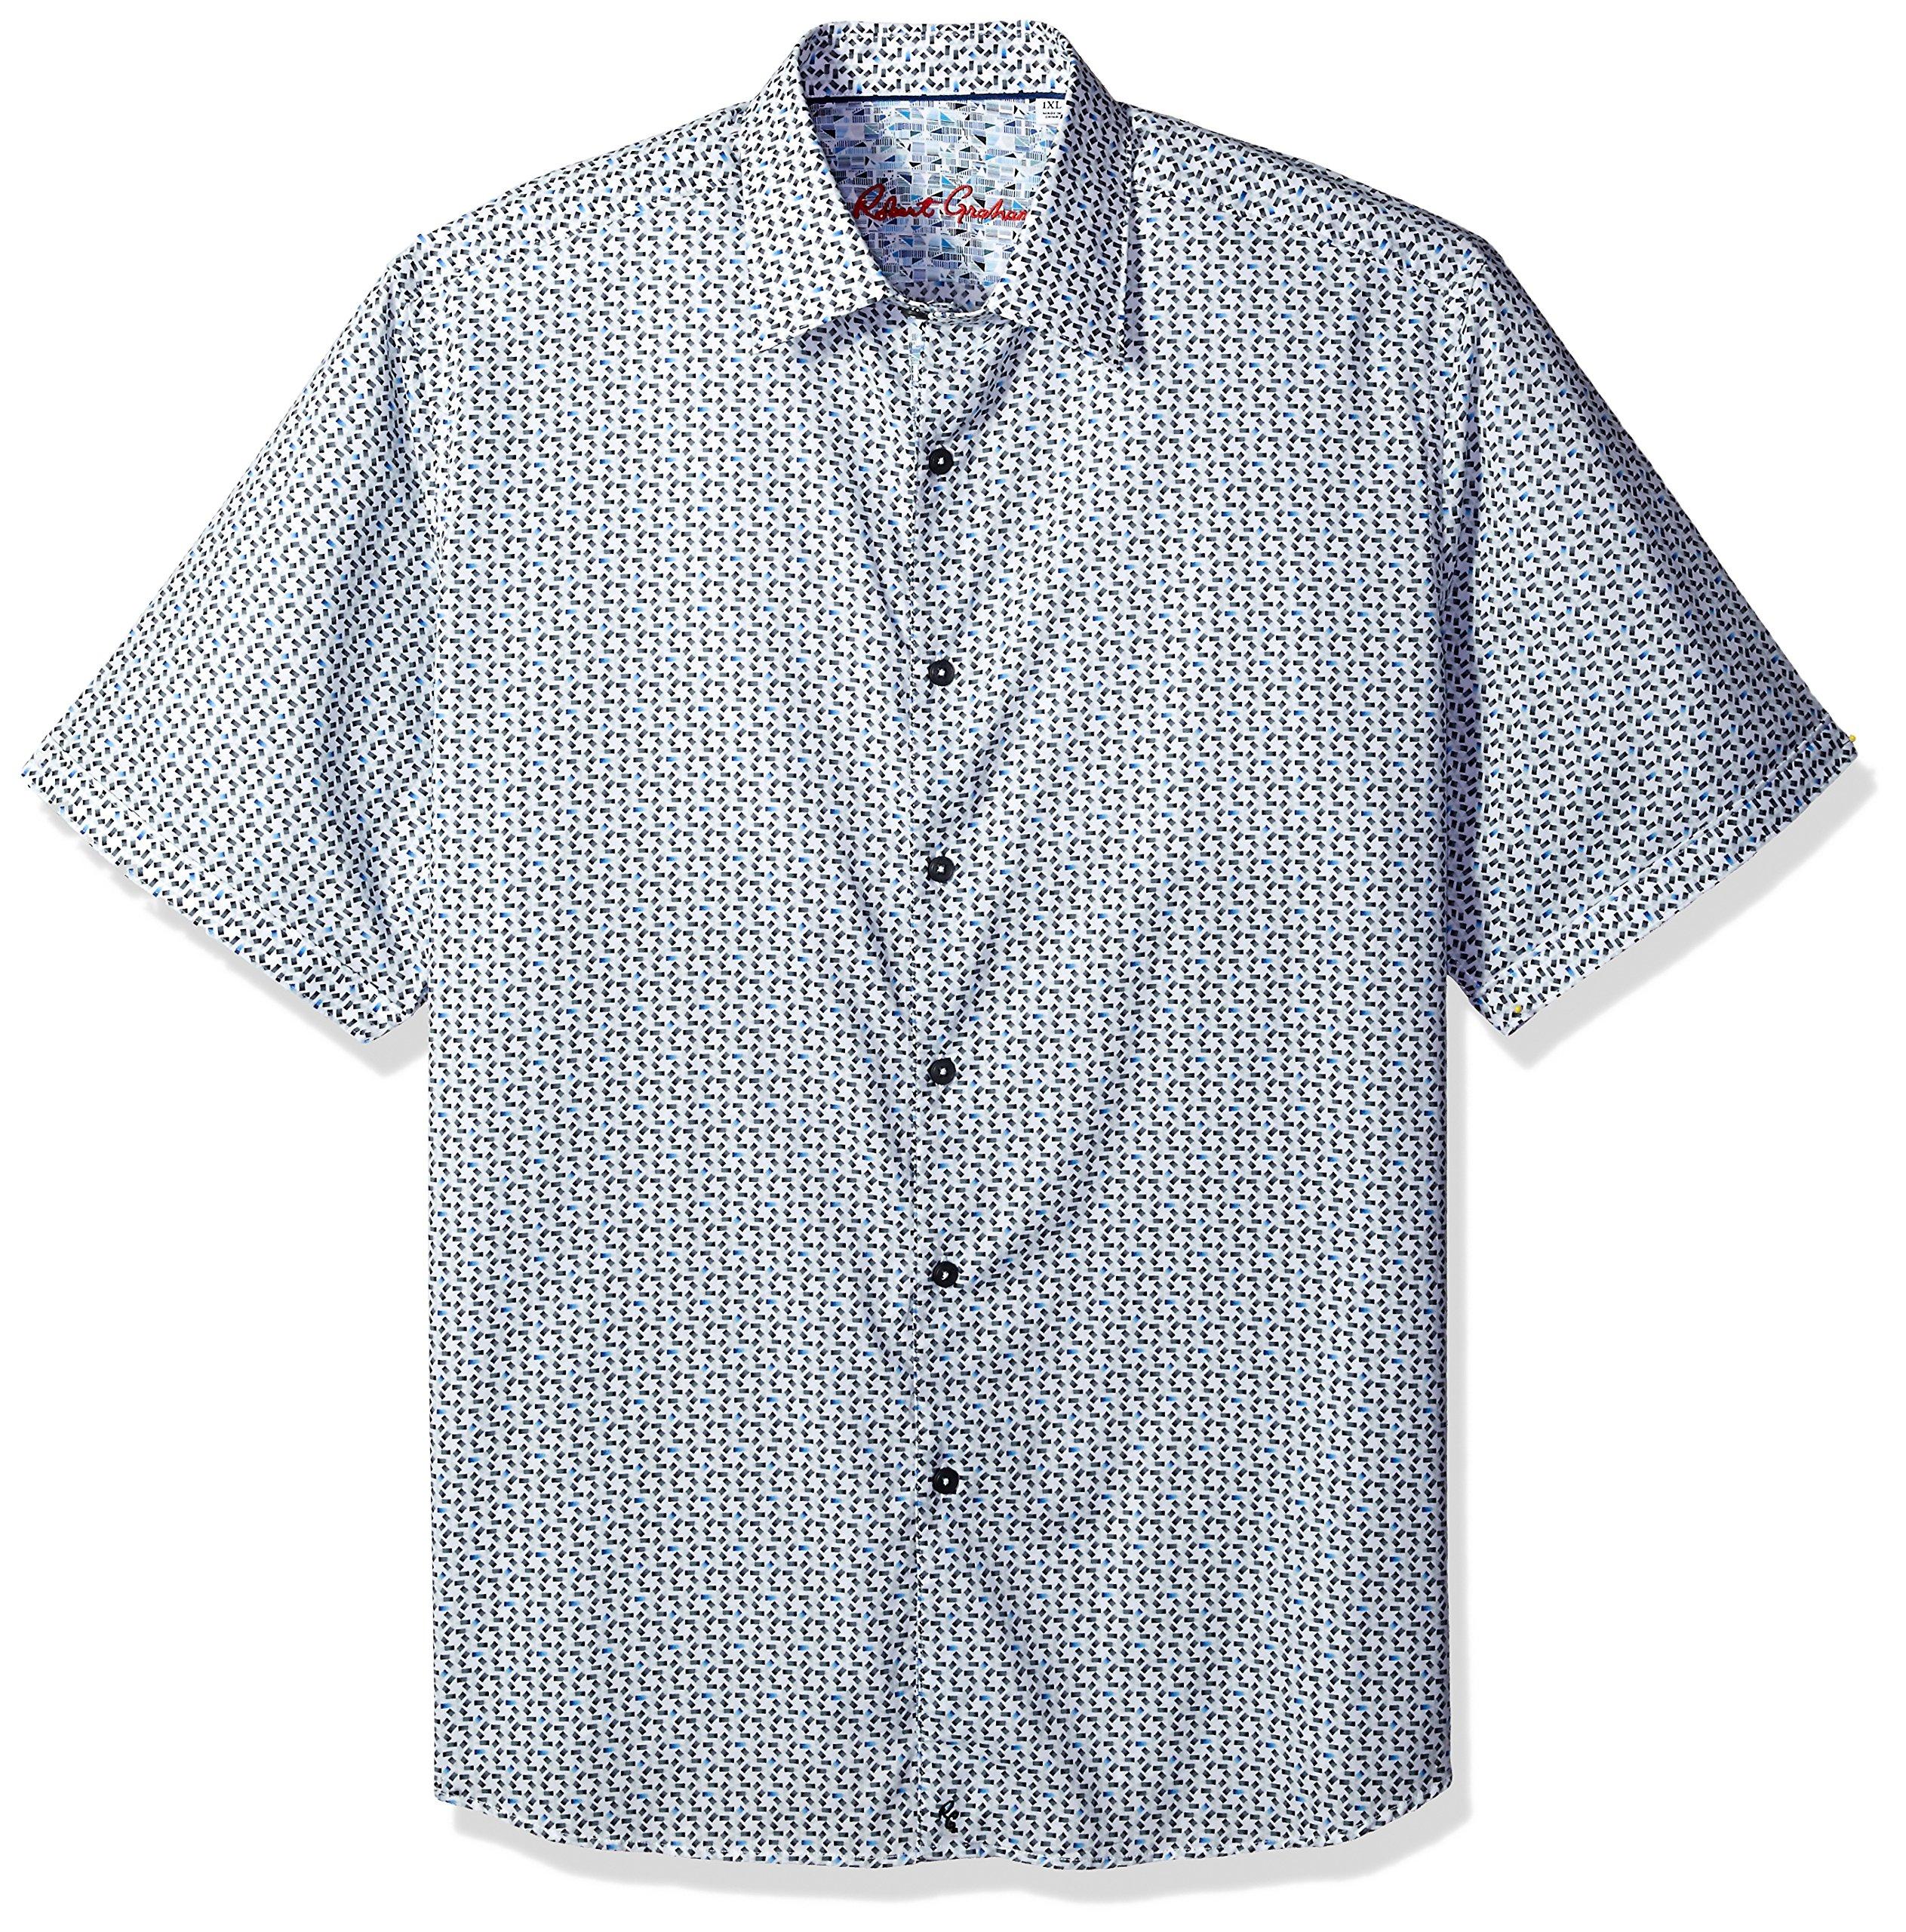 Robert Graham Men's Downey S/s Classic Fit Woven Shirt, White 3XL